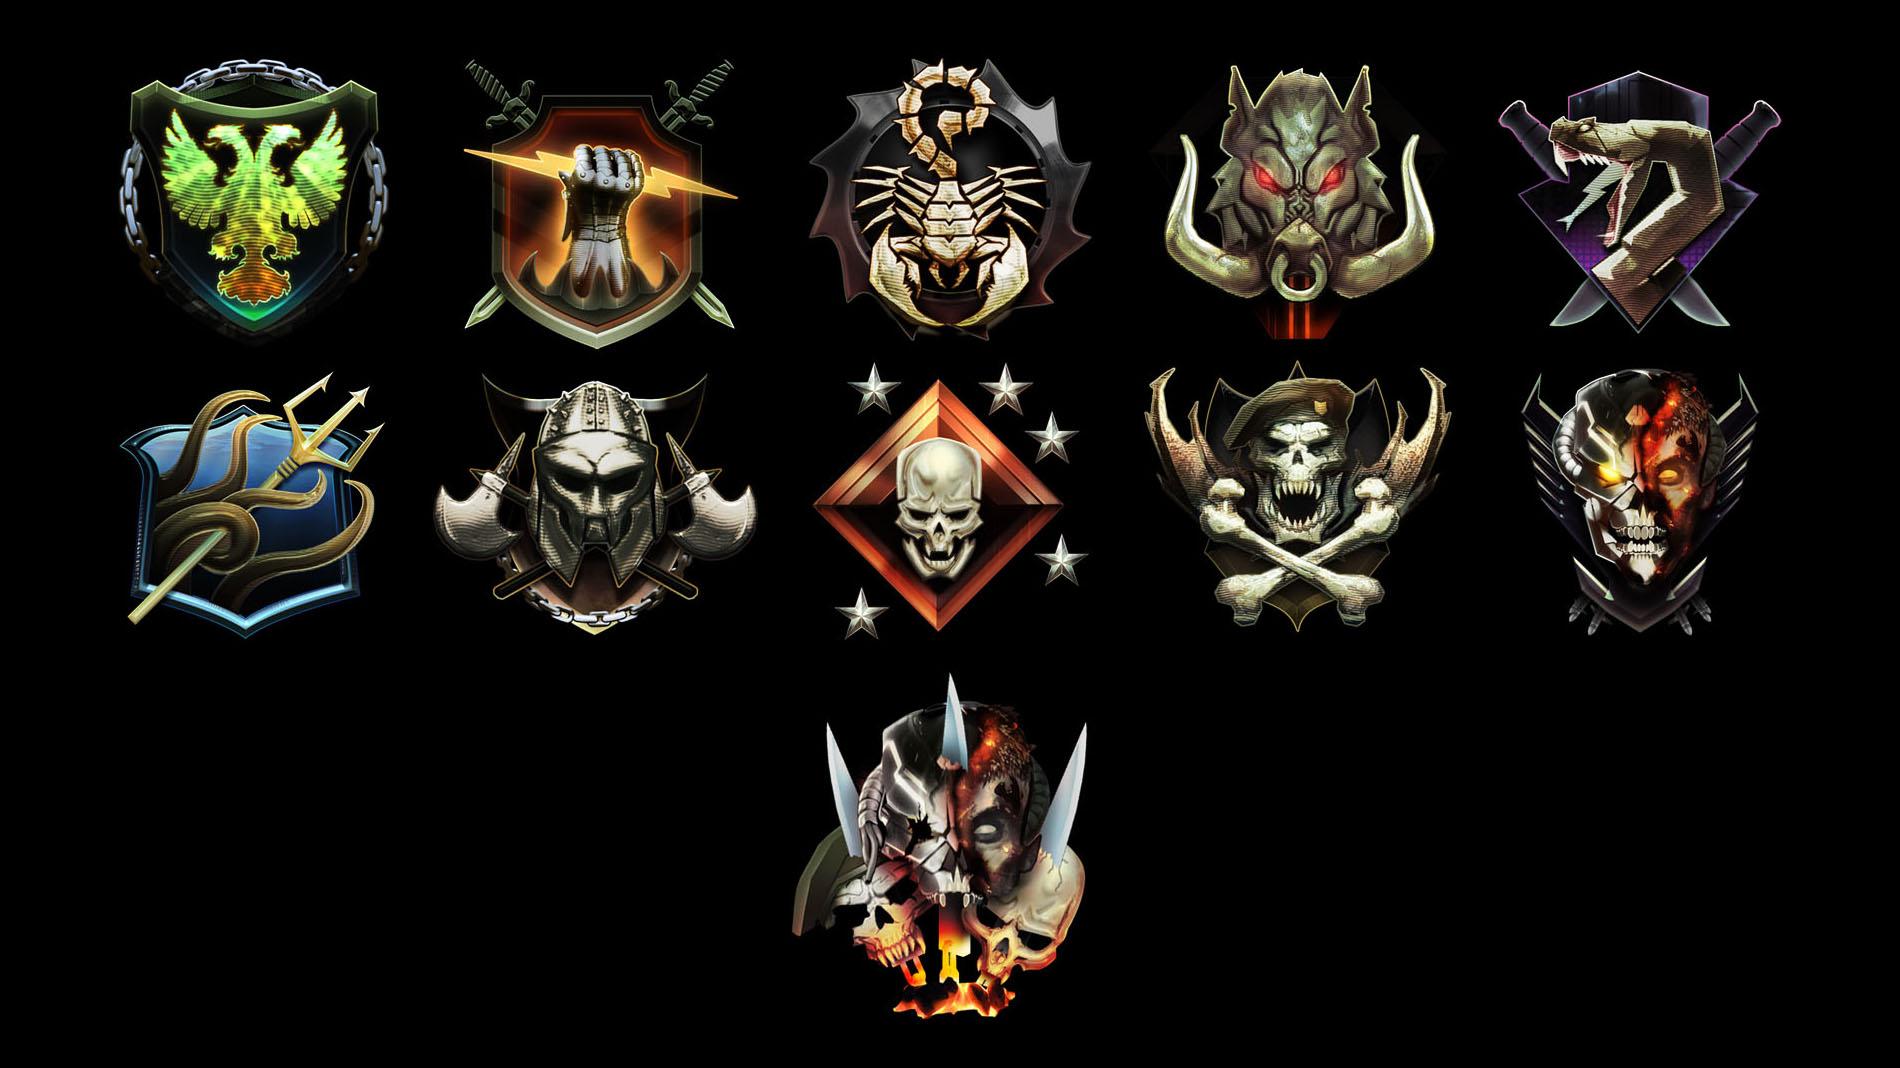 Black Ops 2 Prestige Emblems wallpaper